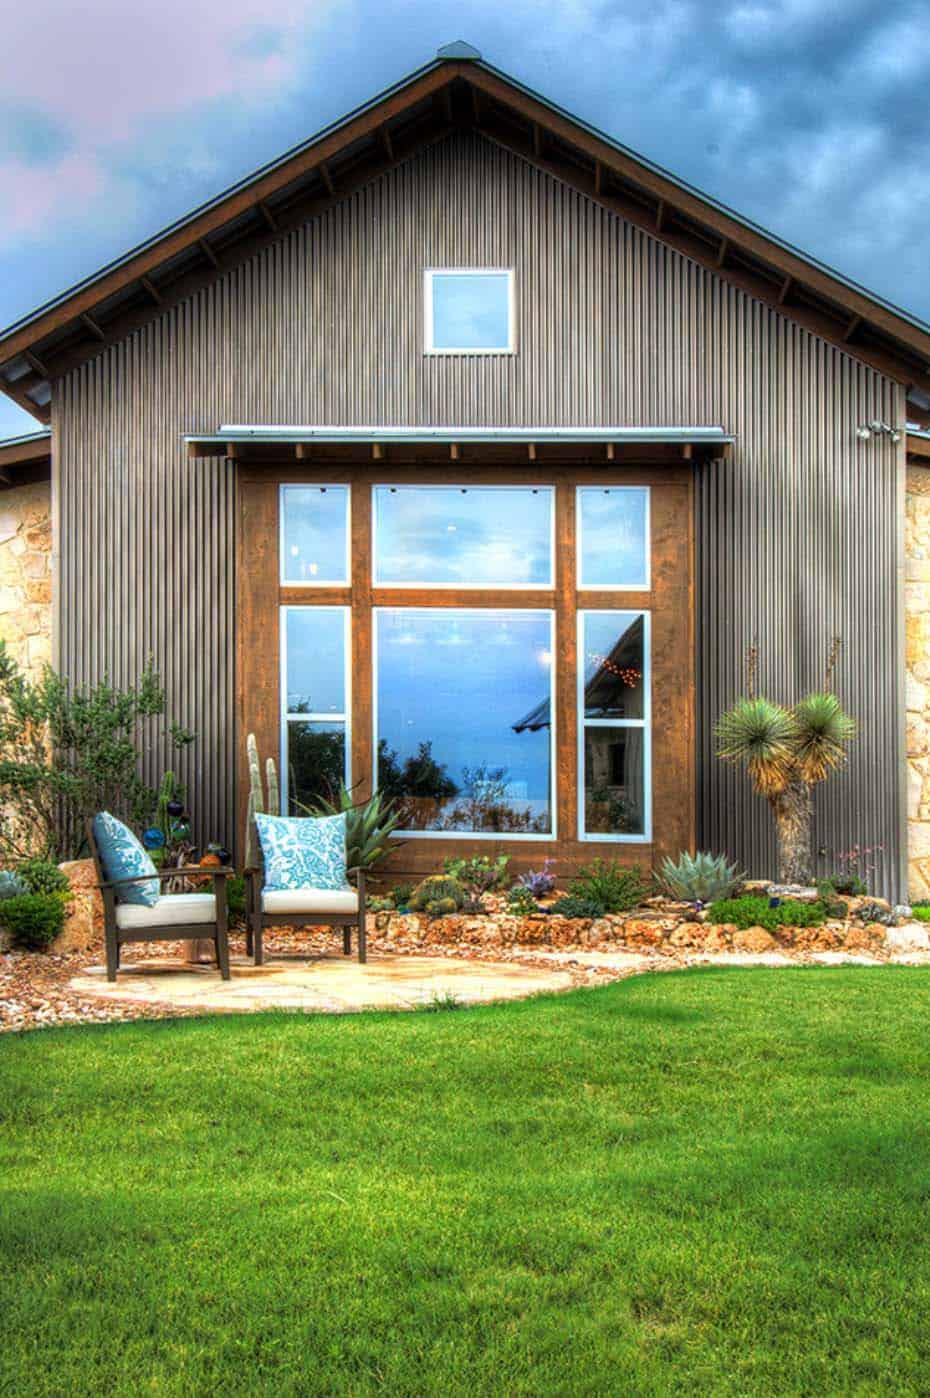 Ranch House-Barn-Burleson Design Group-18-1 Kindesign